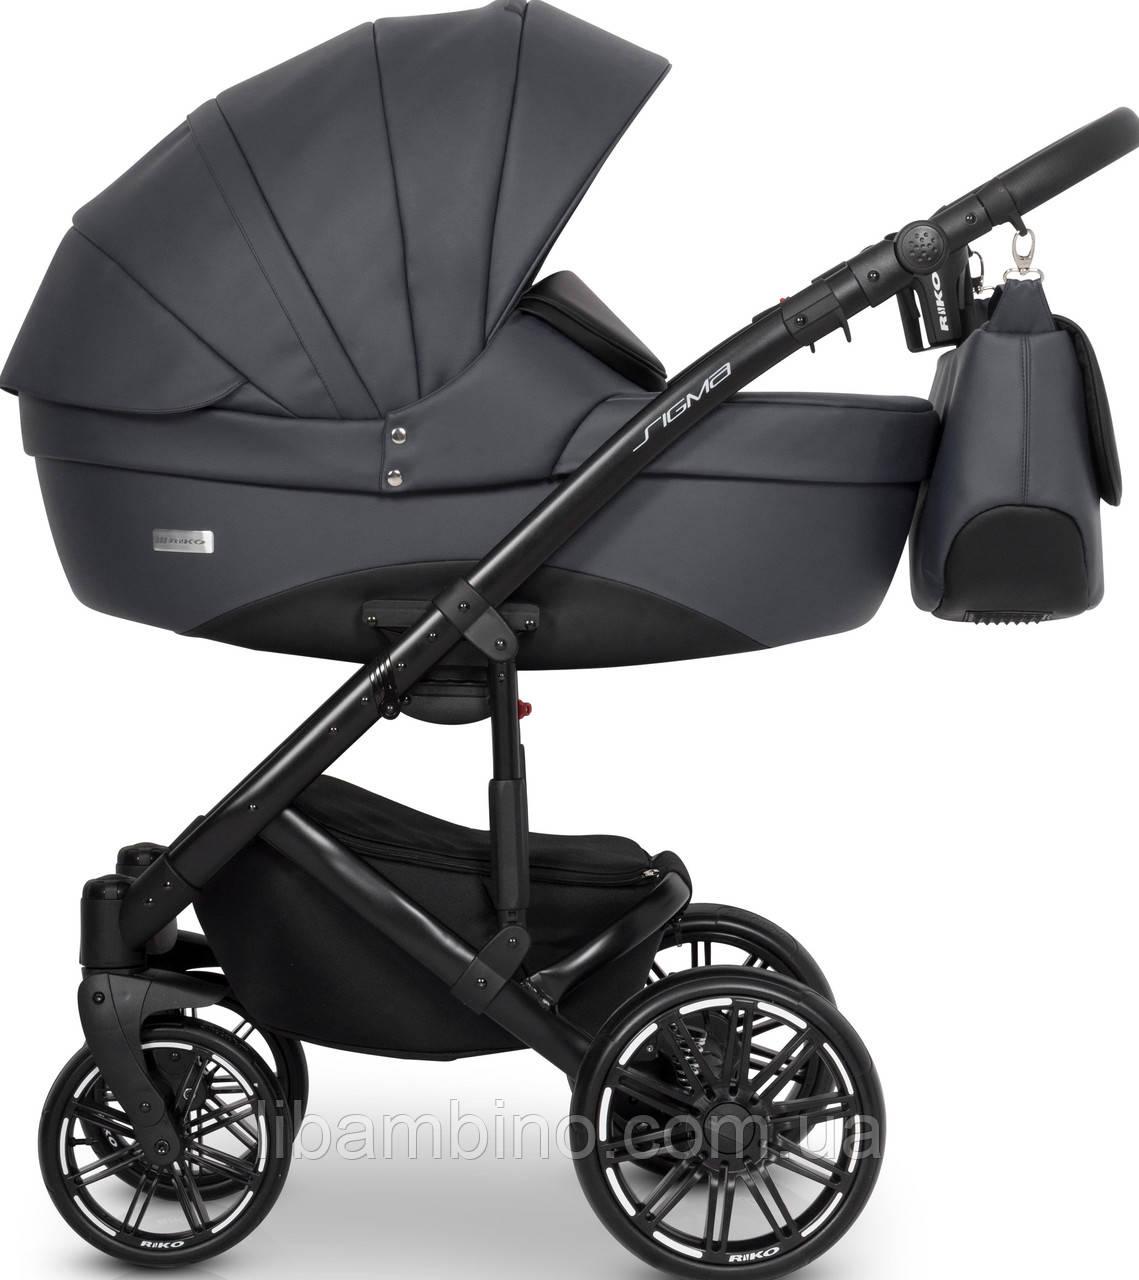 Дитяча універсальна коляска 2 в 1 Riko Sigma 01 Antracite